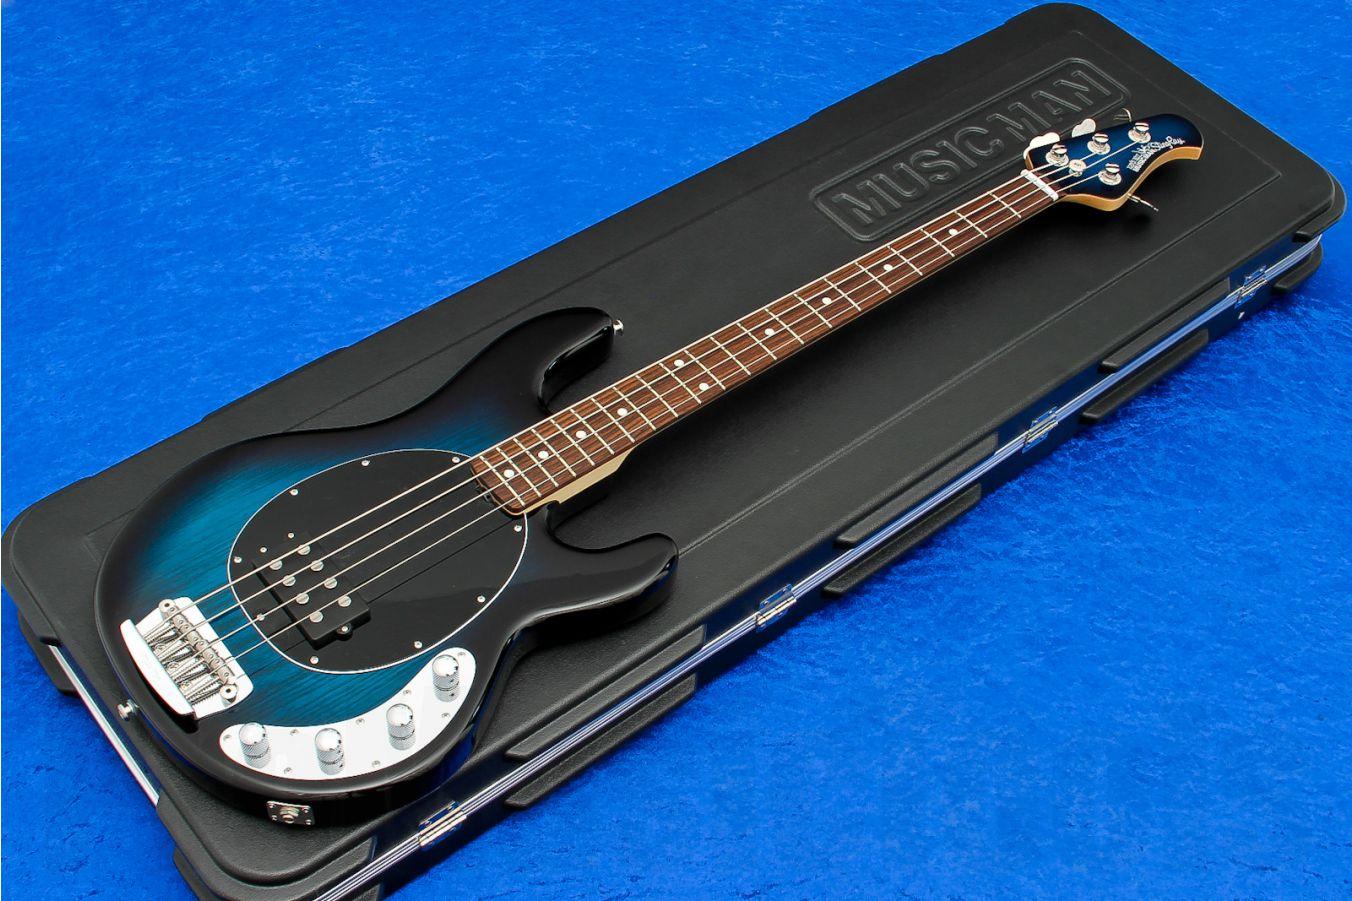 Music Man USA Stingray 4 PBB - Pacific Blue Burst RW MH